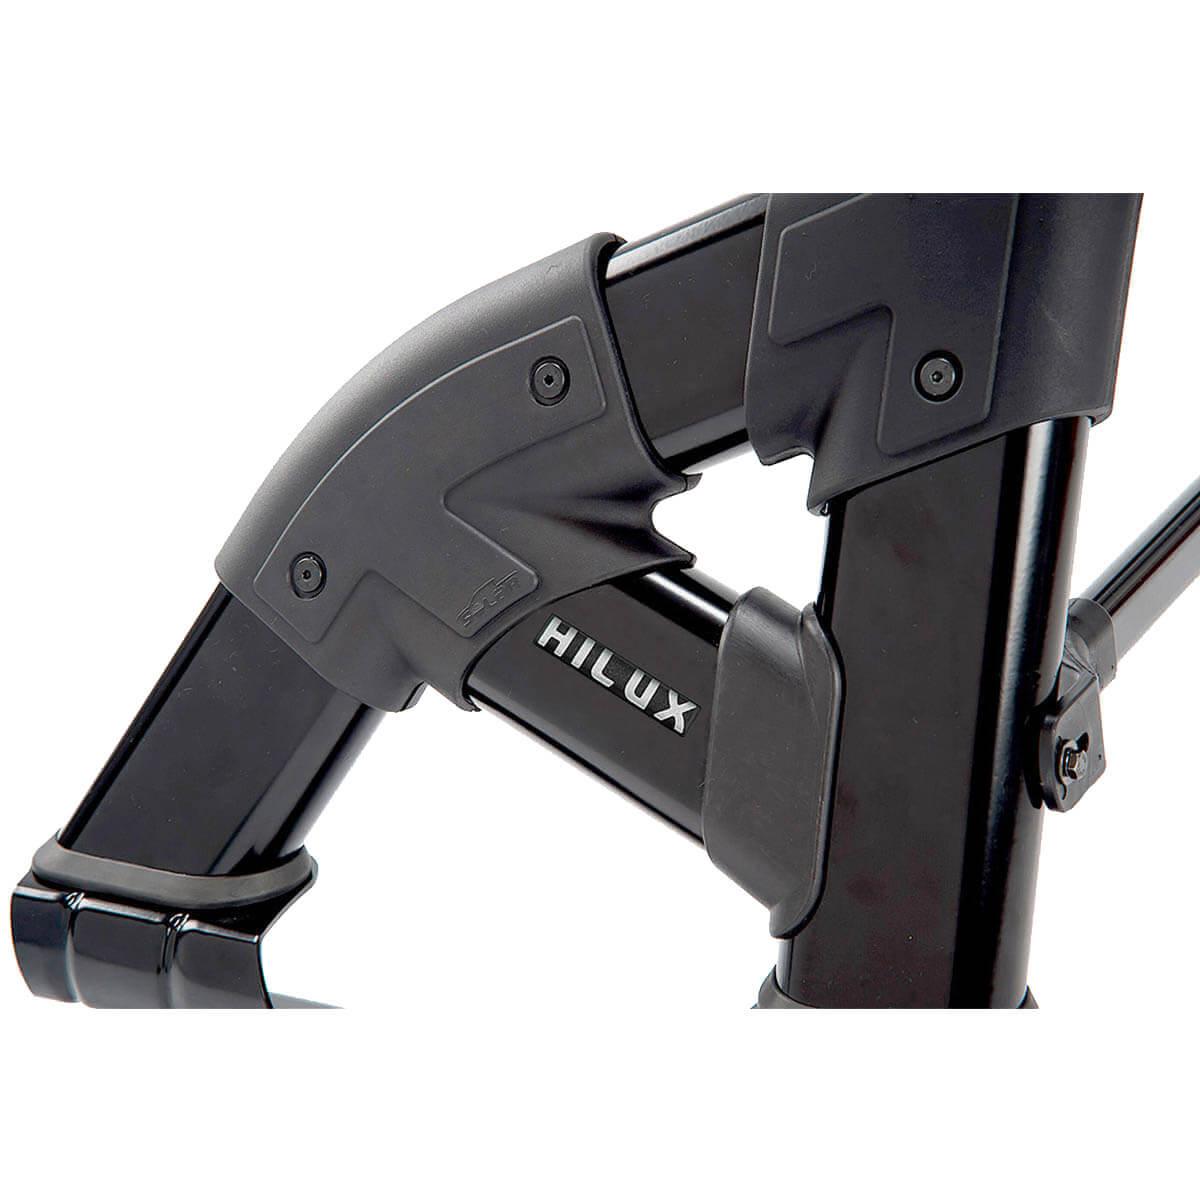 Santo antônio preto Solar Exclusive Hilux 2005 a 2015 com barra de vidro